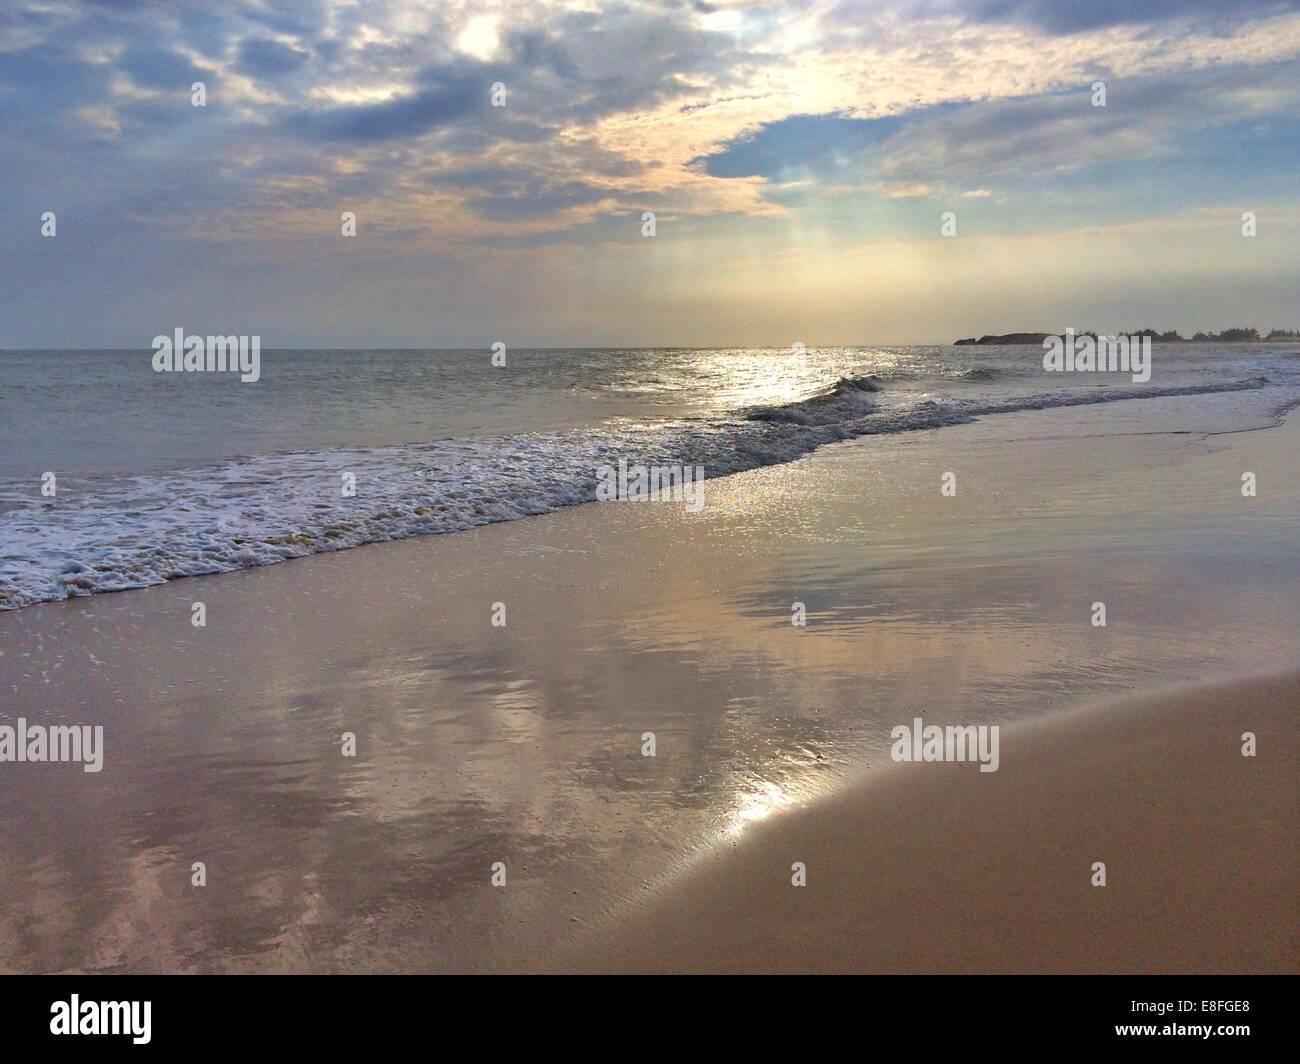 Empty beach at sunrise, Phan Thiet, Vietnam - Stock Image